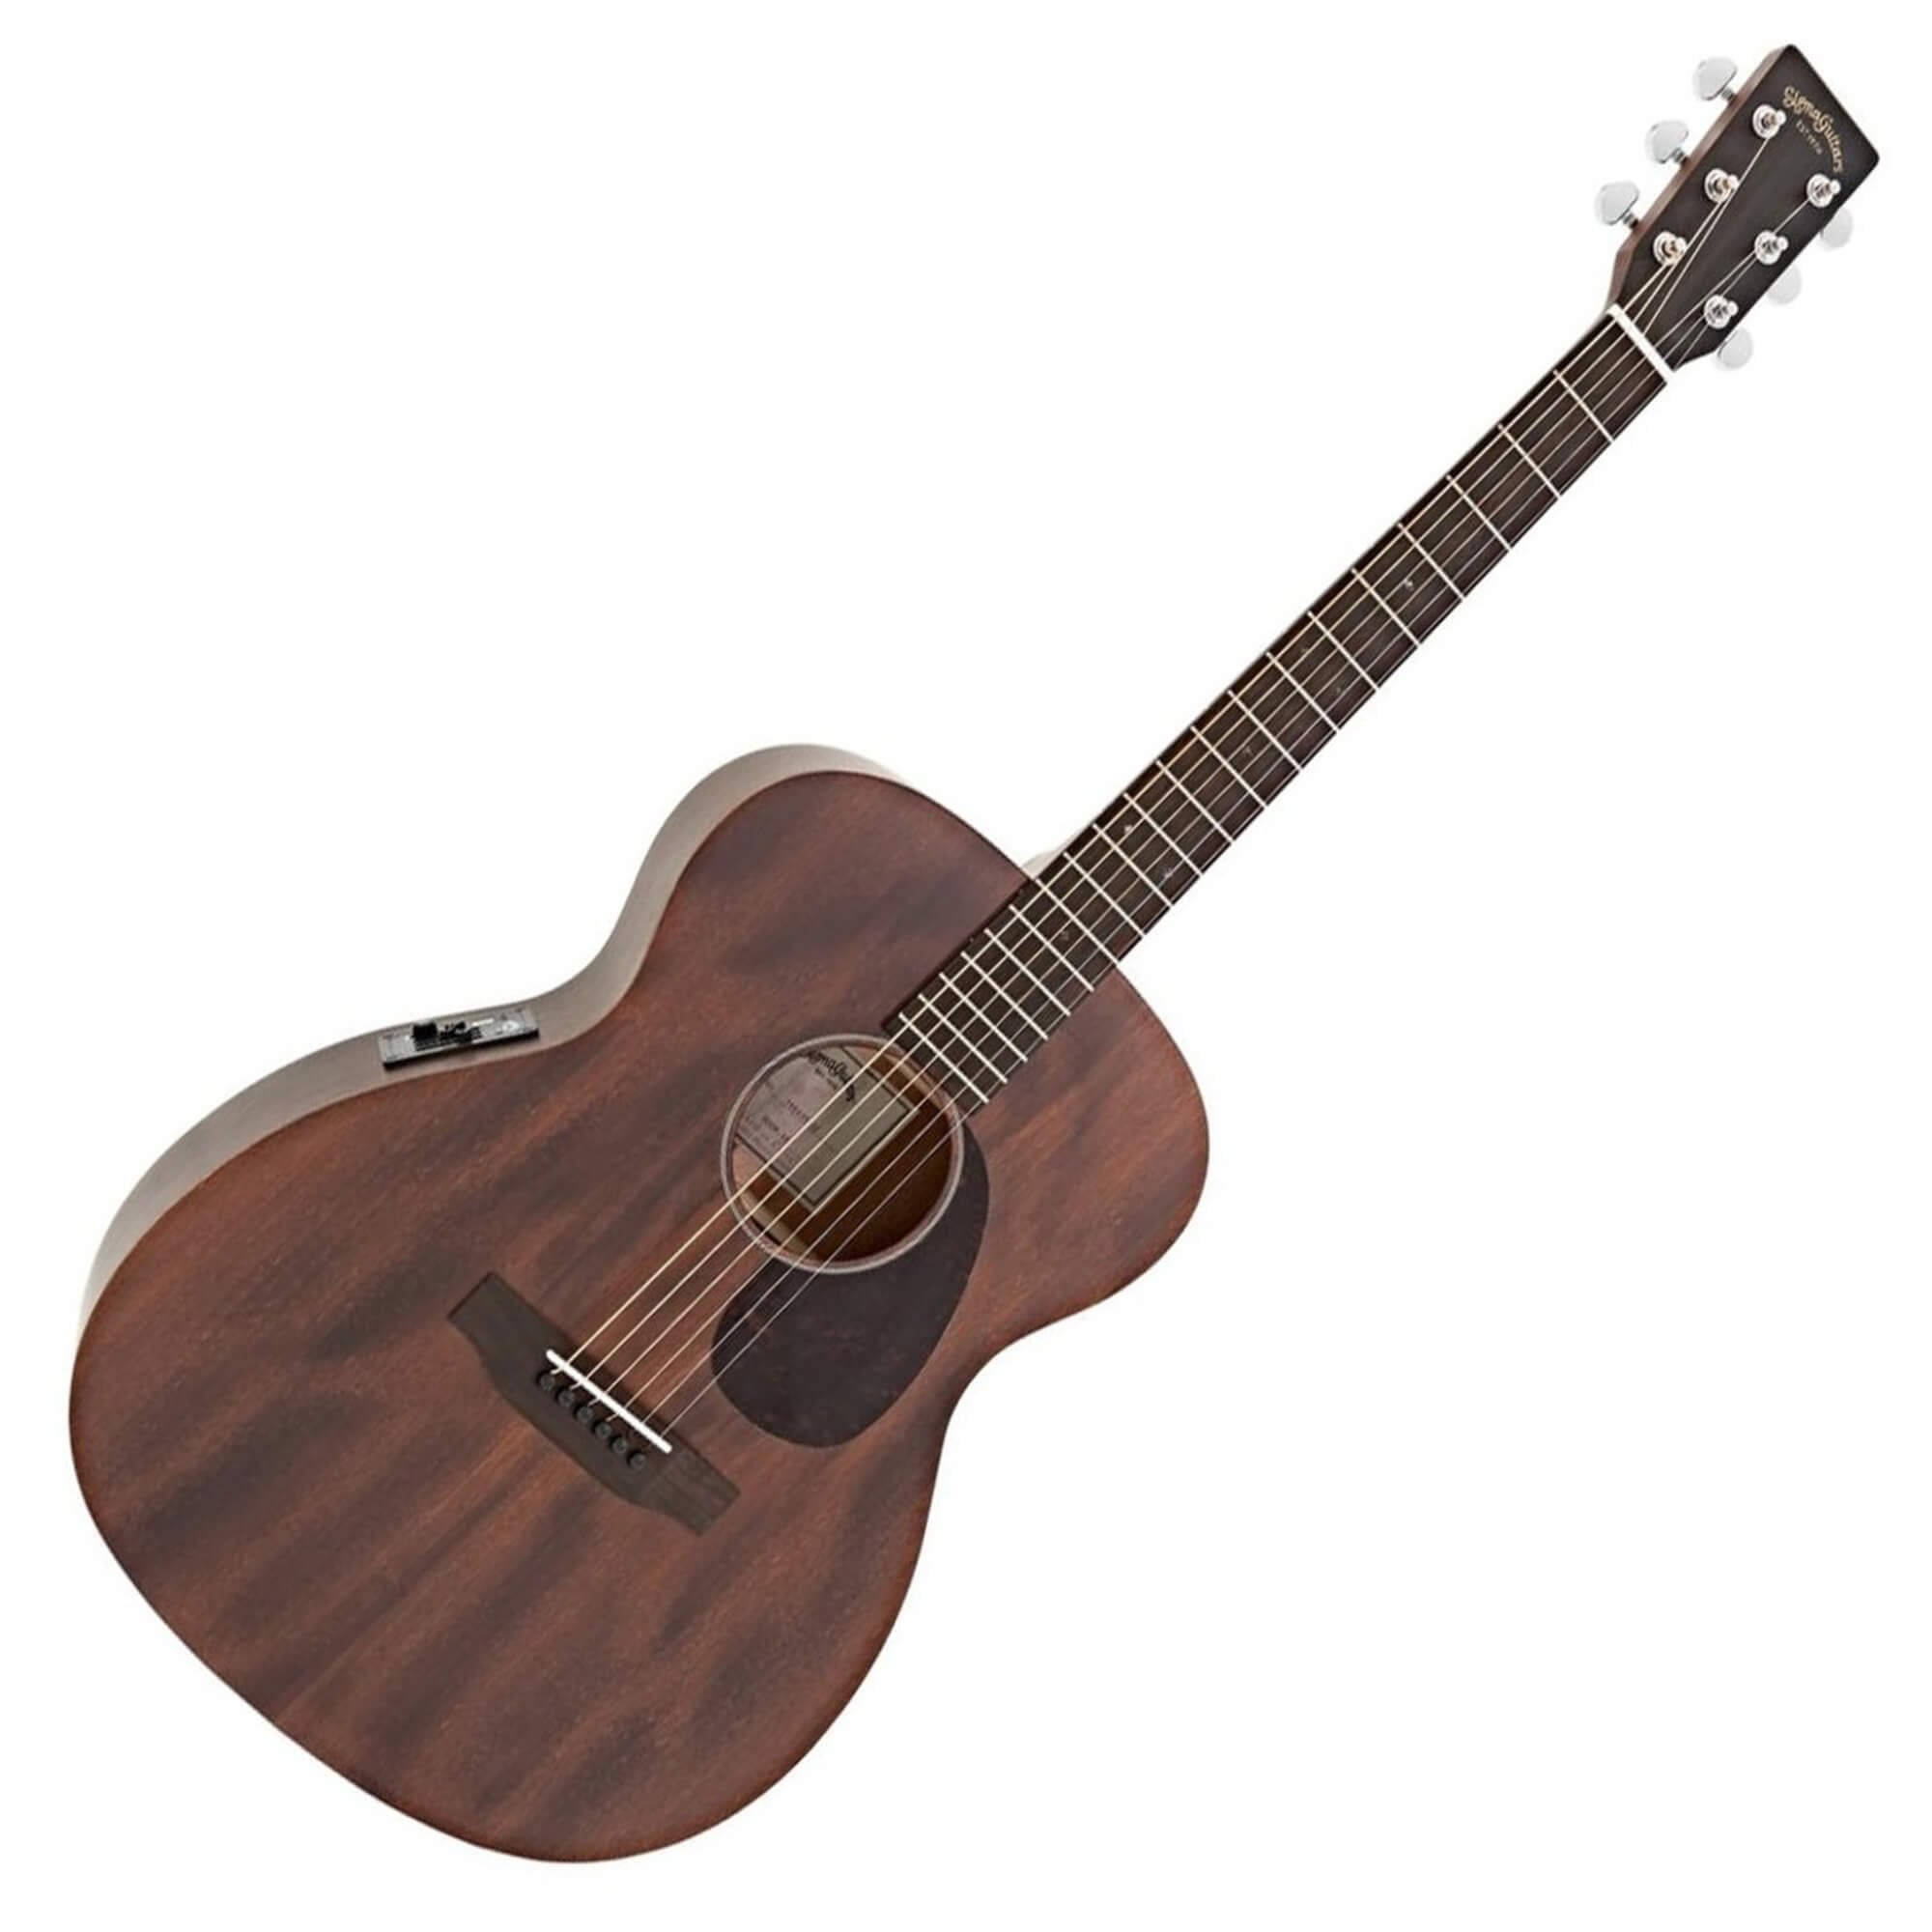 Sigma 15 Series 000M-15E+ Electro-Acoustic Guitar - UK Custom